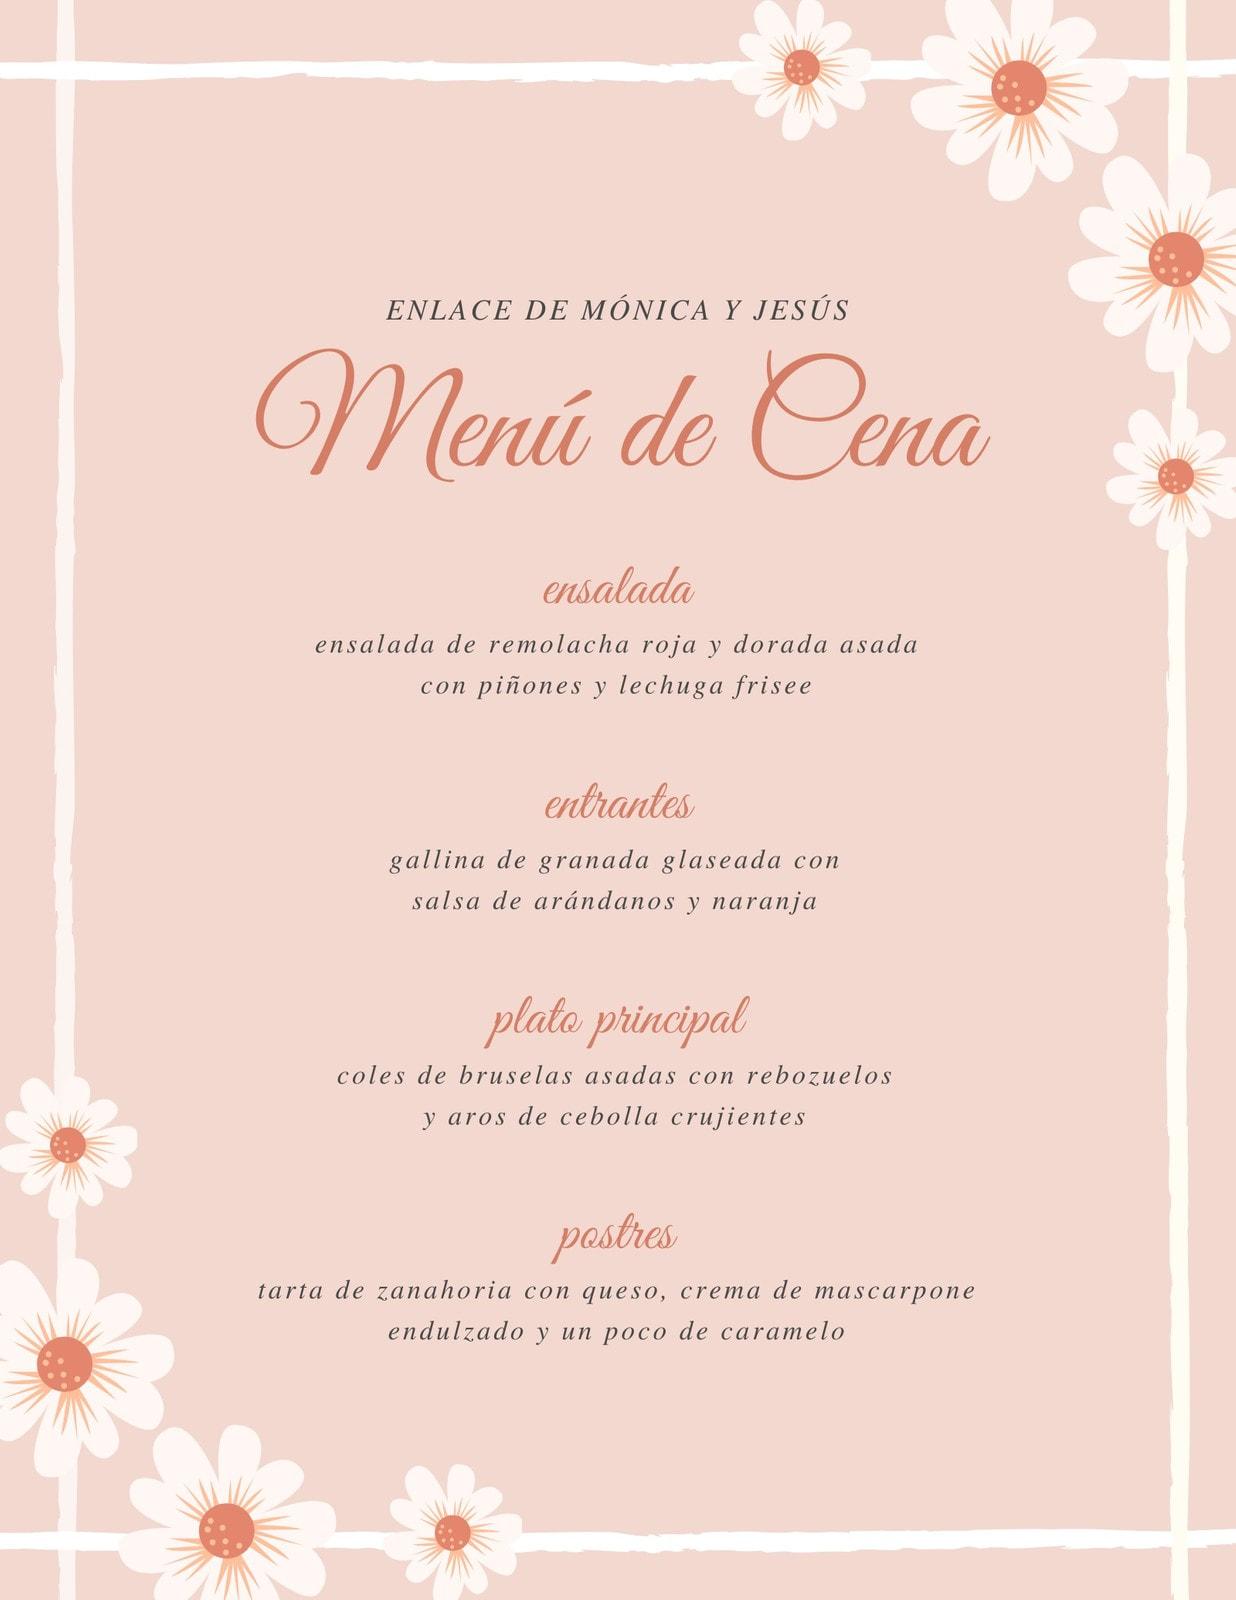 Naranja Melocotón Floral Borde Marco Boda Menú